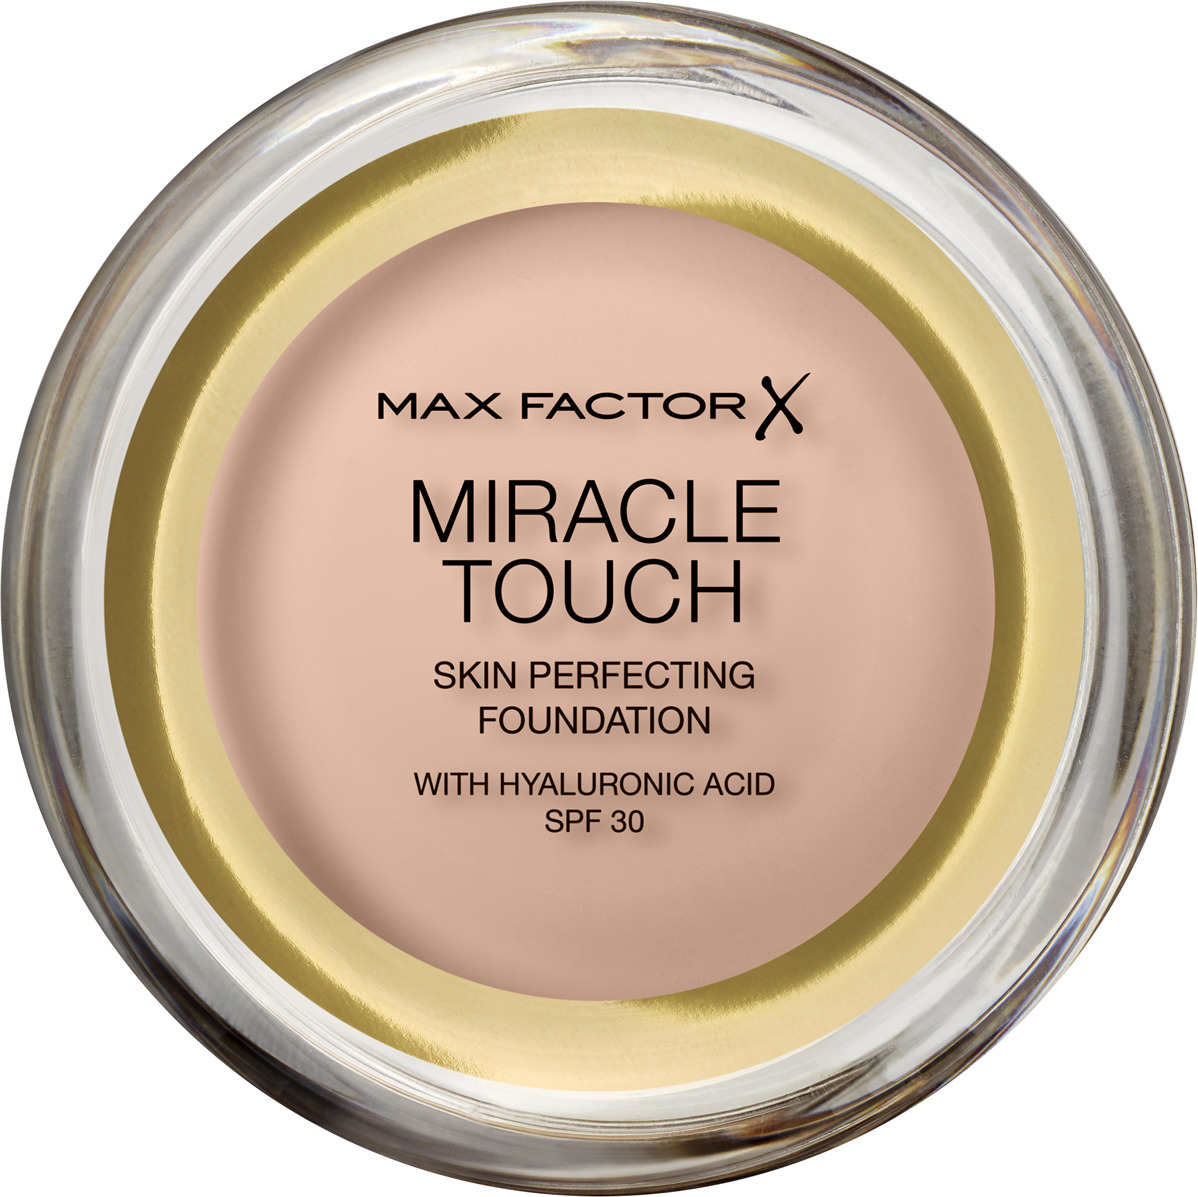 Тональная основа Max Factor Miracle Touch, SPF 30, тон 40 Creamy Ivory, 11 мл max factor тональная основа miracle match тон bronze 80